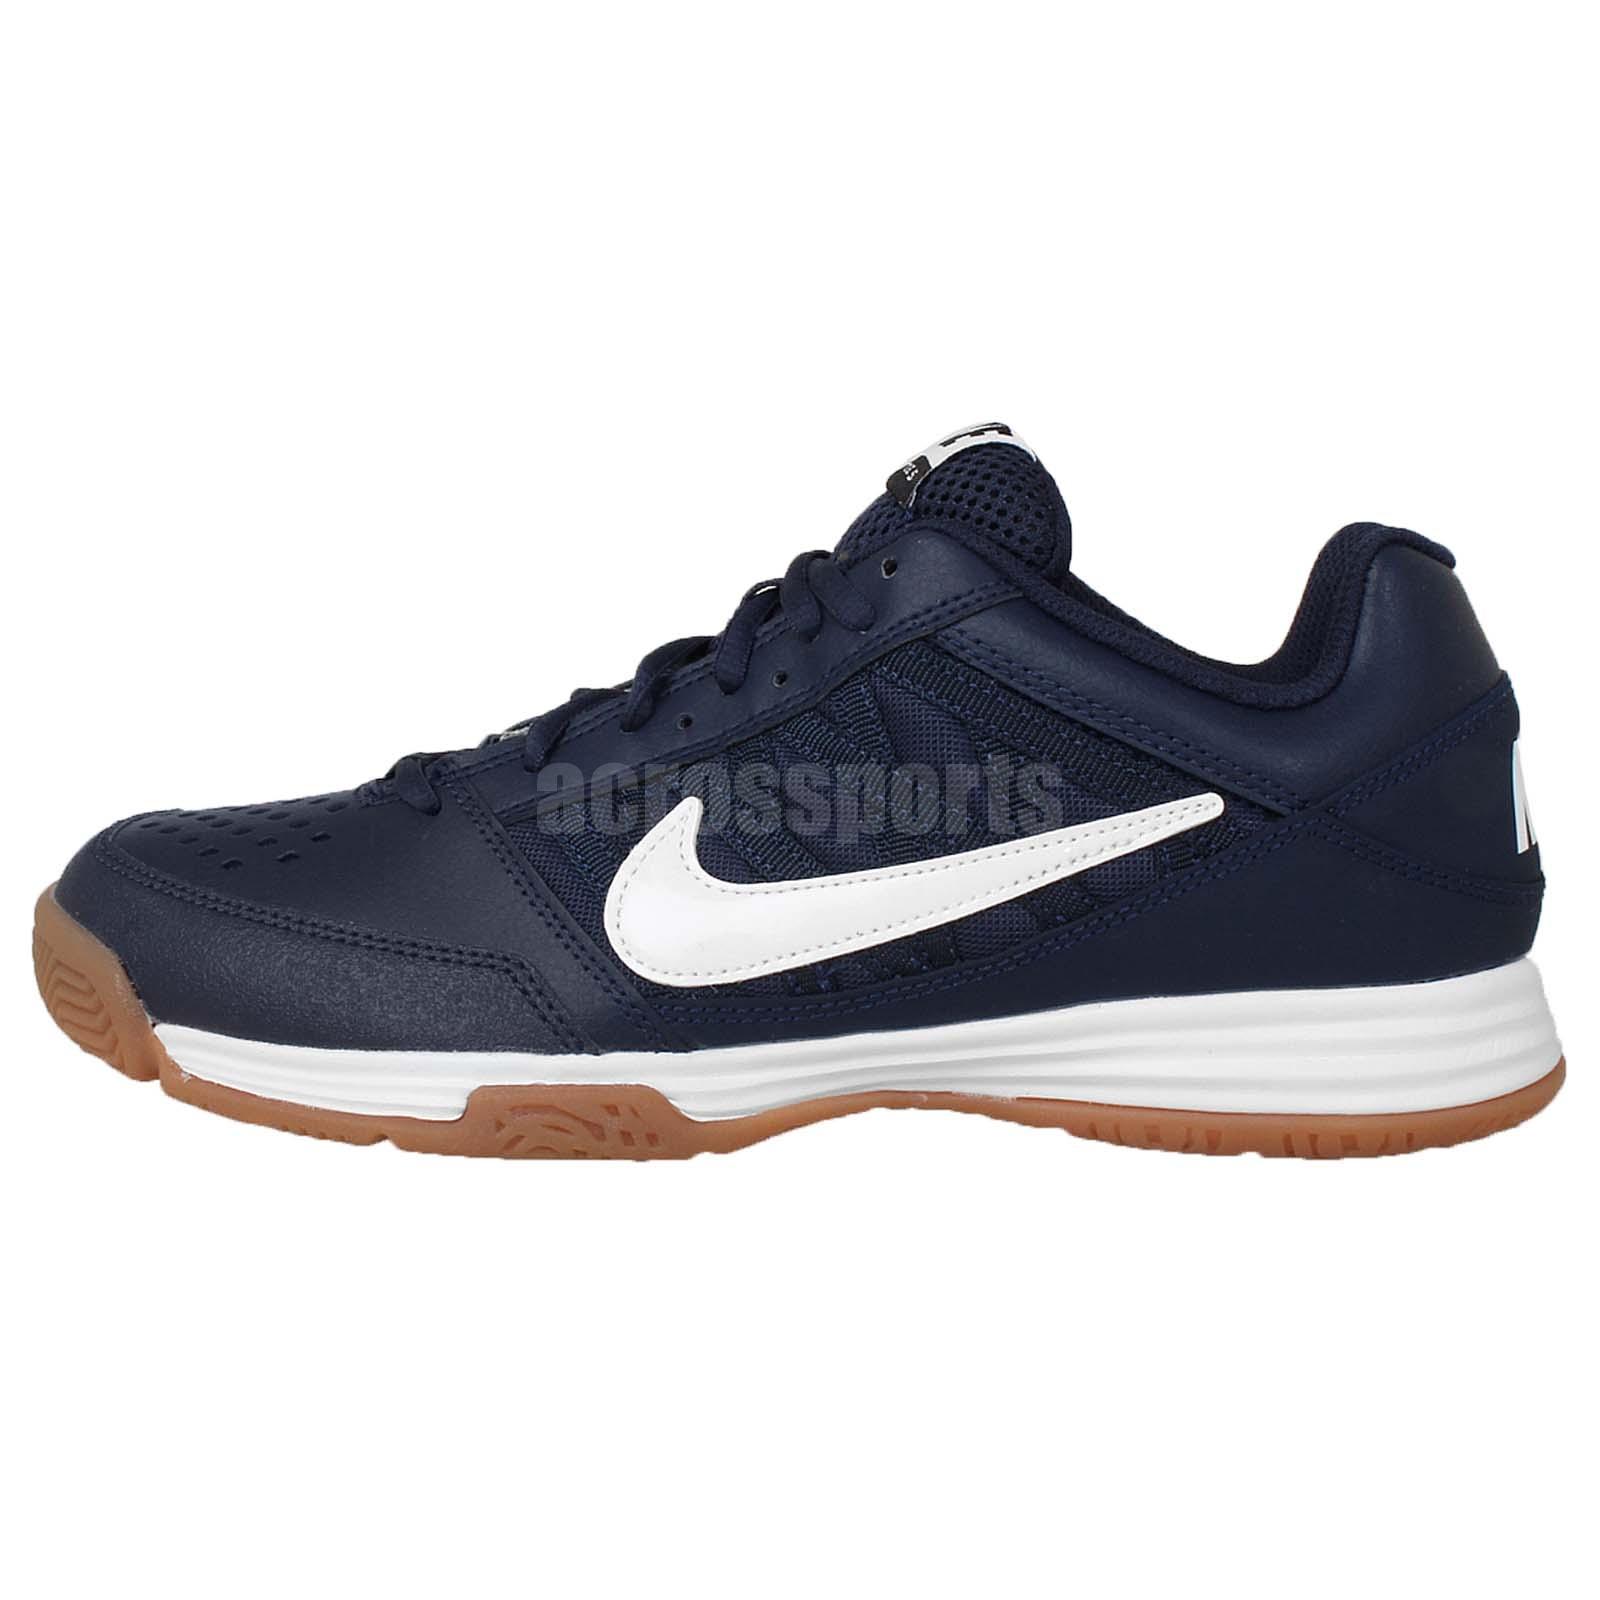 Luxury Nike Air Extreme Volley  Women39s Volleyball Shoe  WhiteMetallic